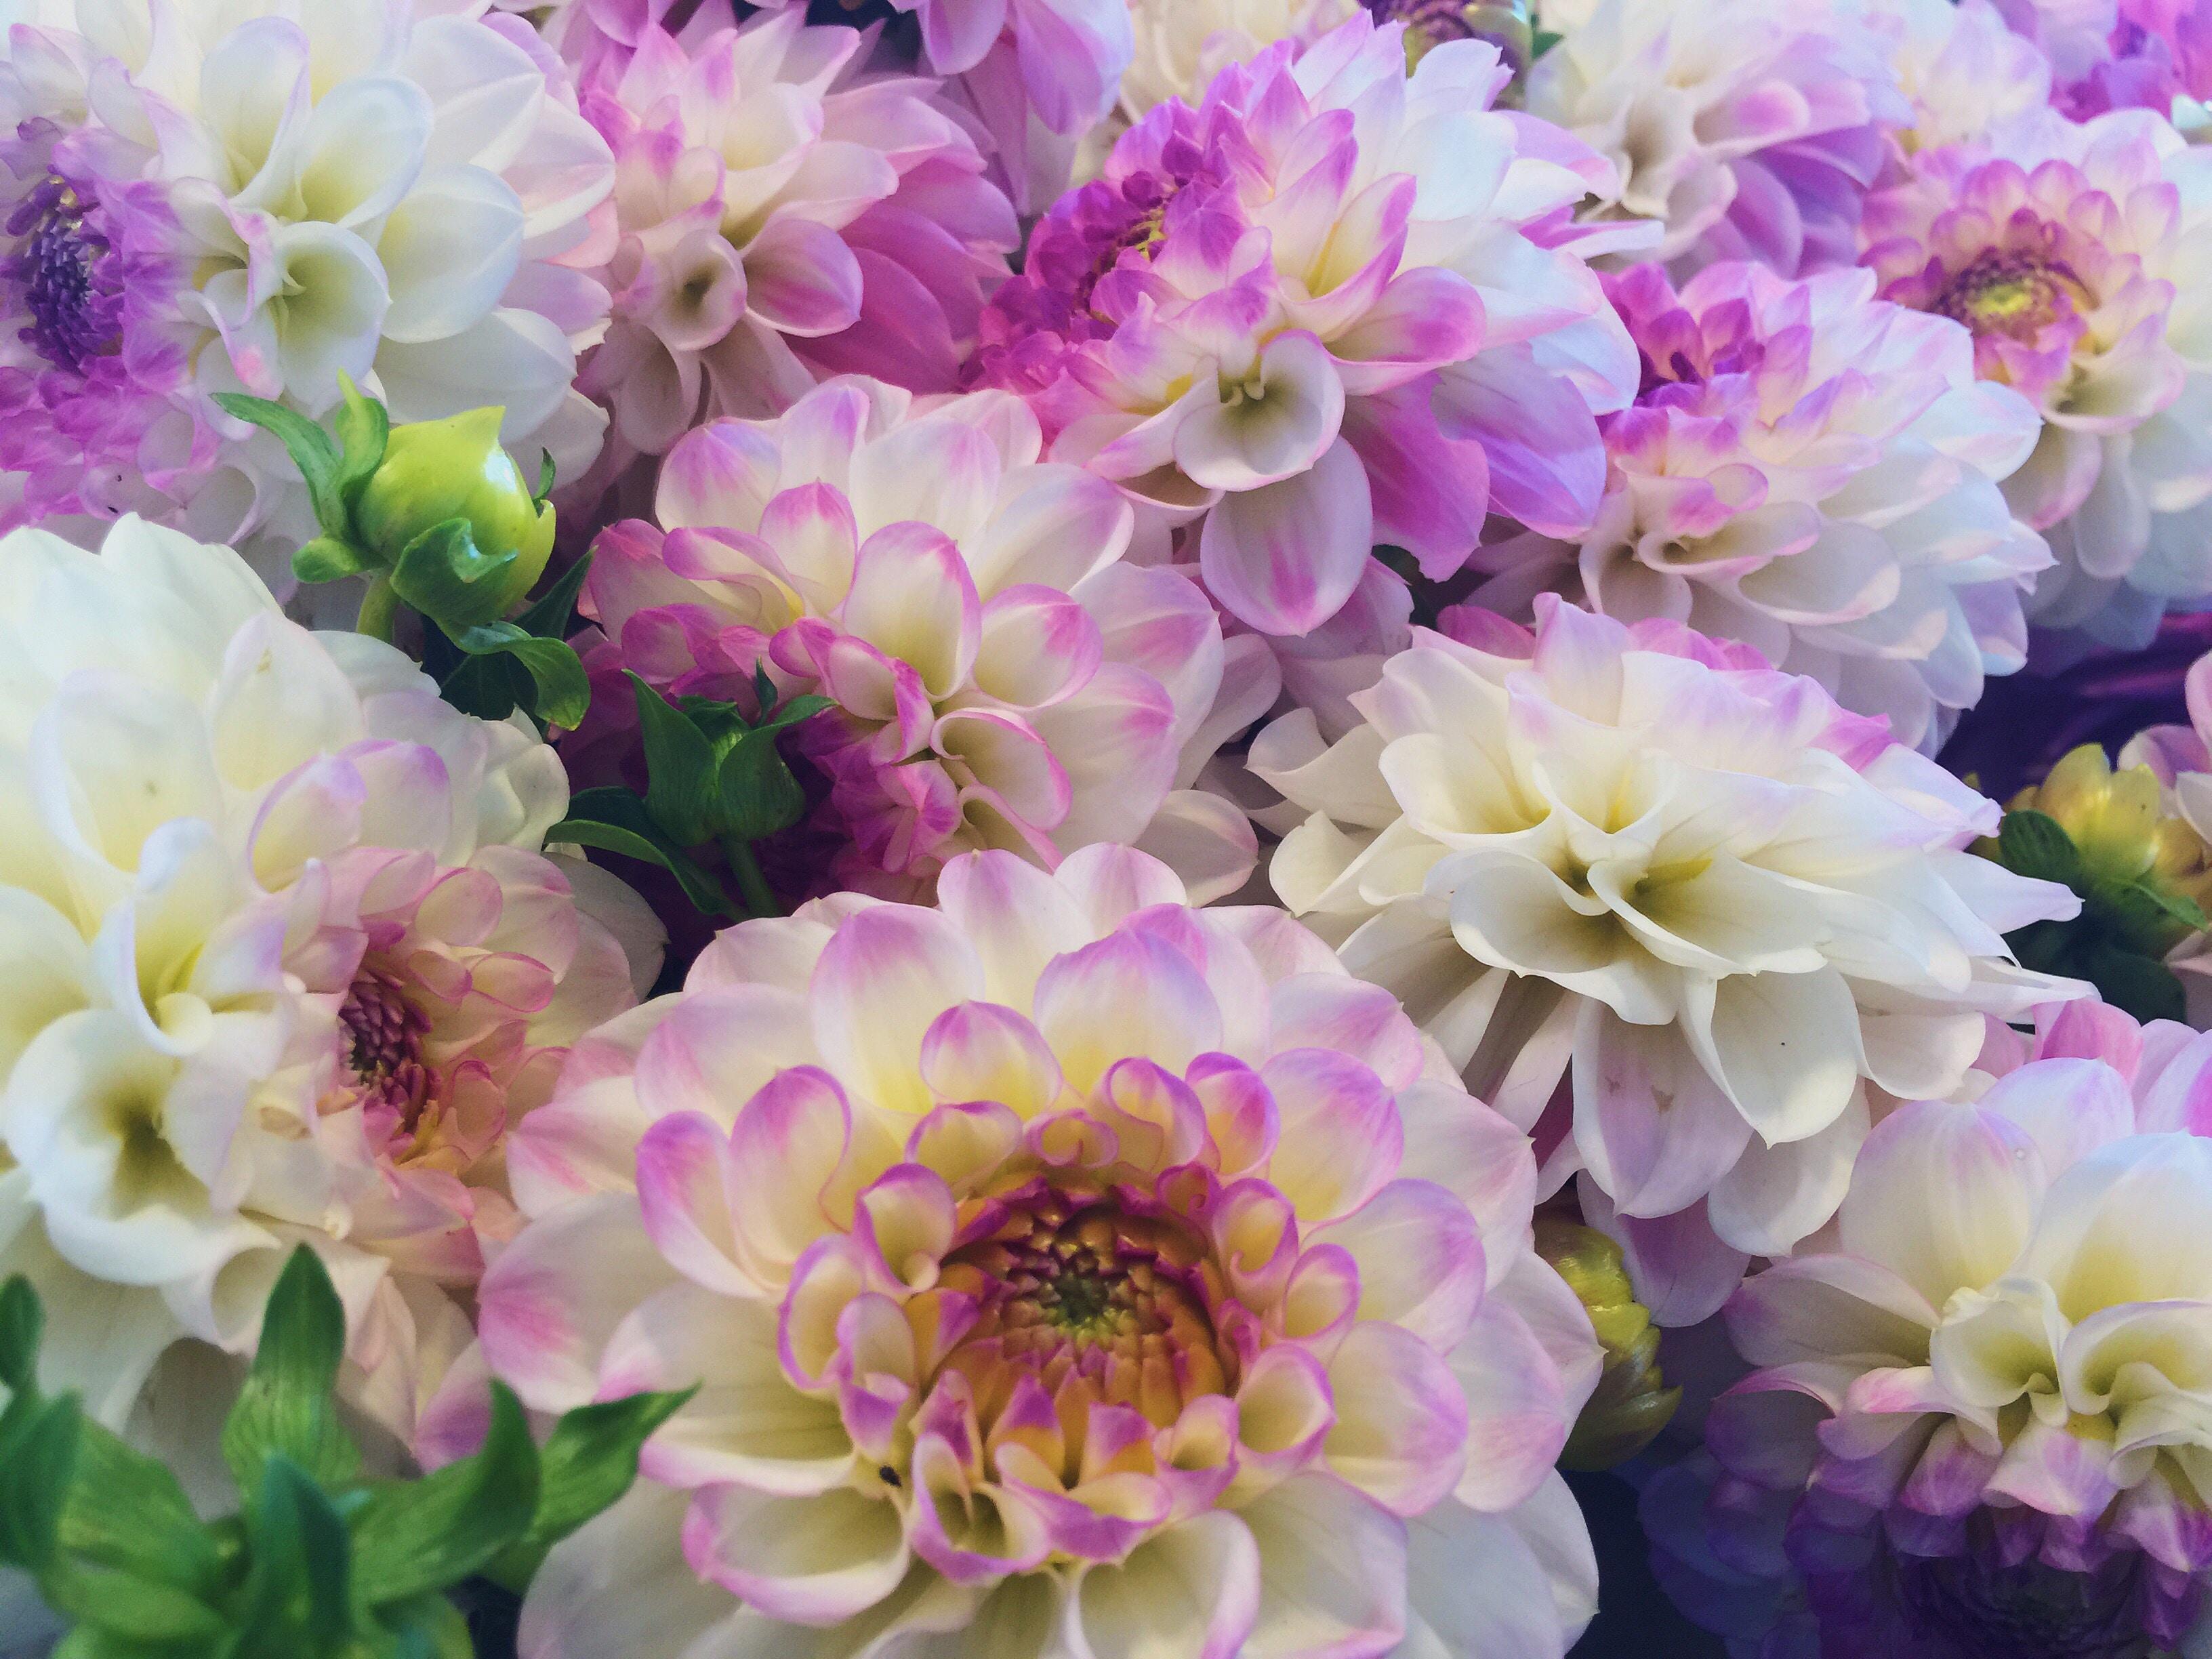 Beautiful white, purple and yellow toned flowers.